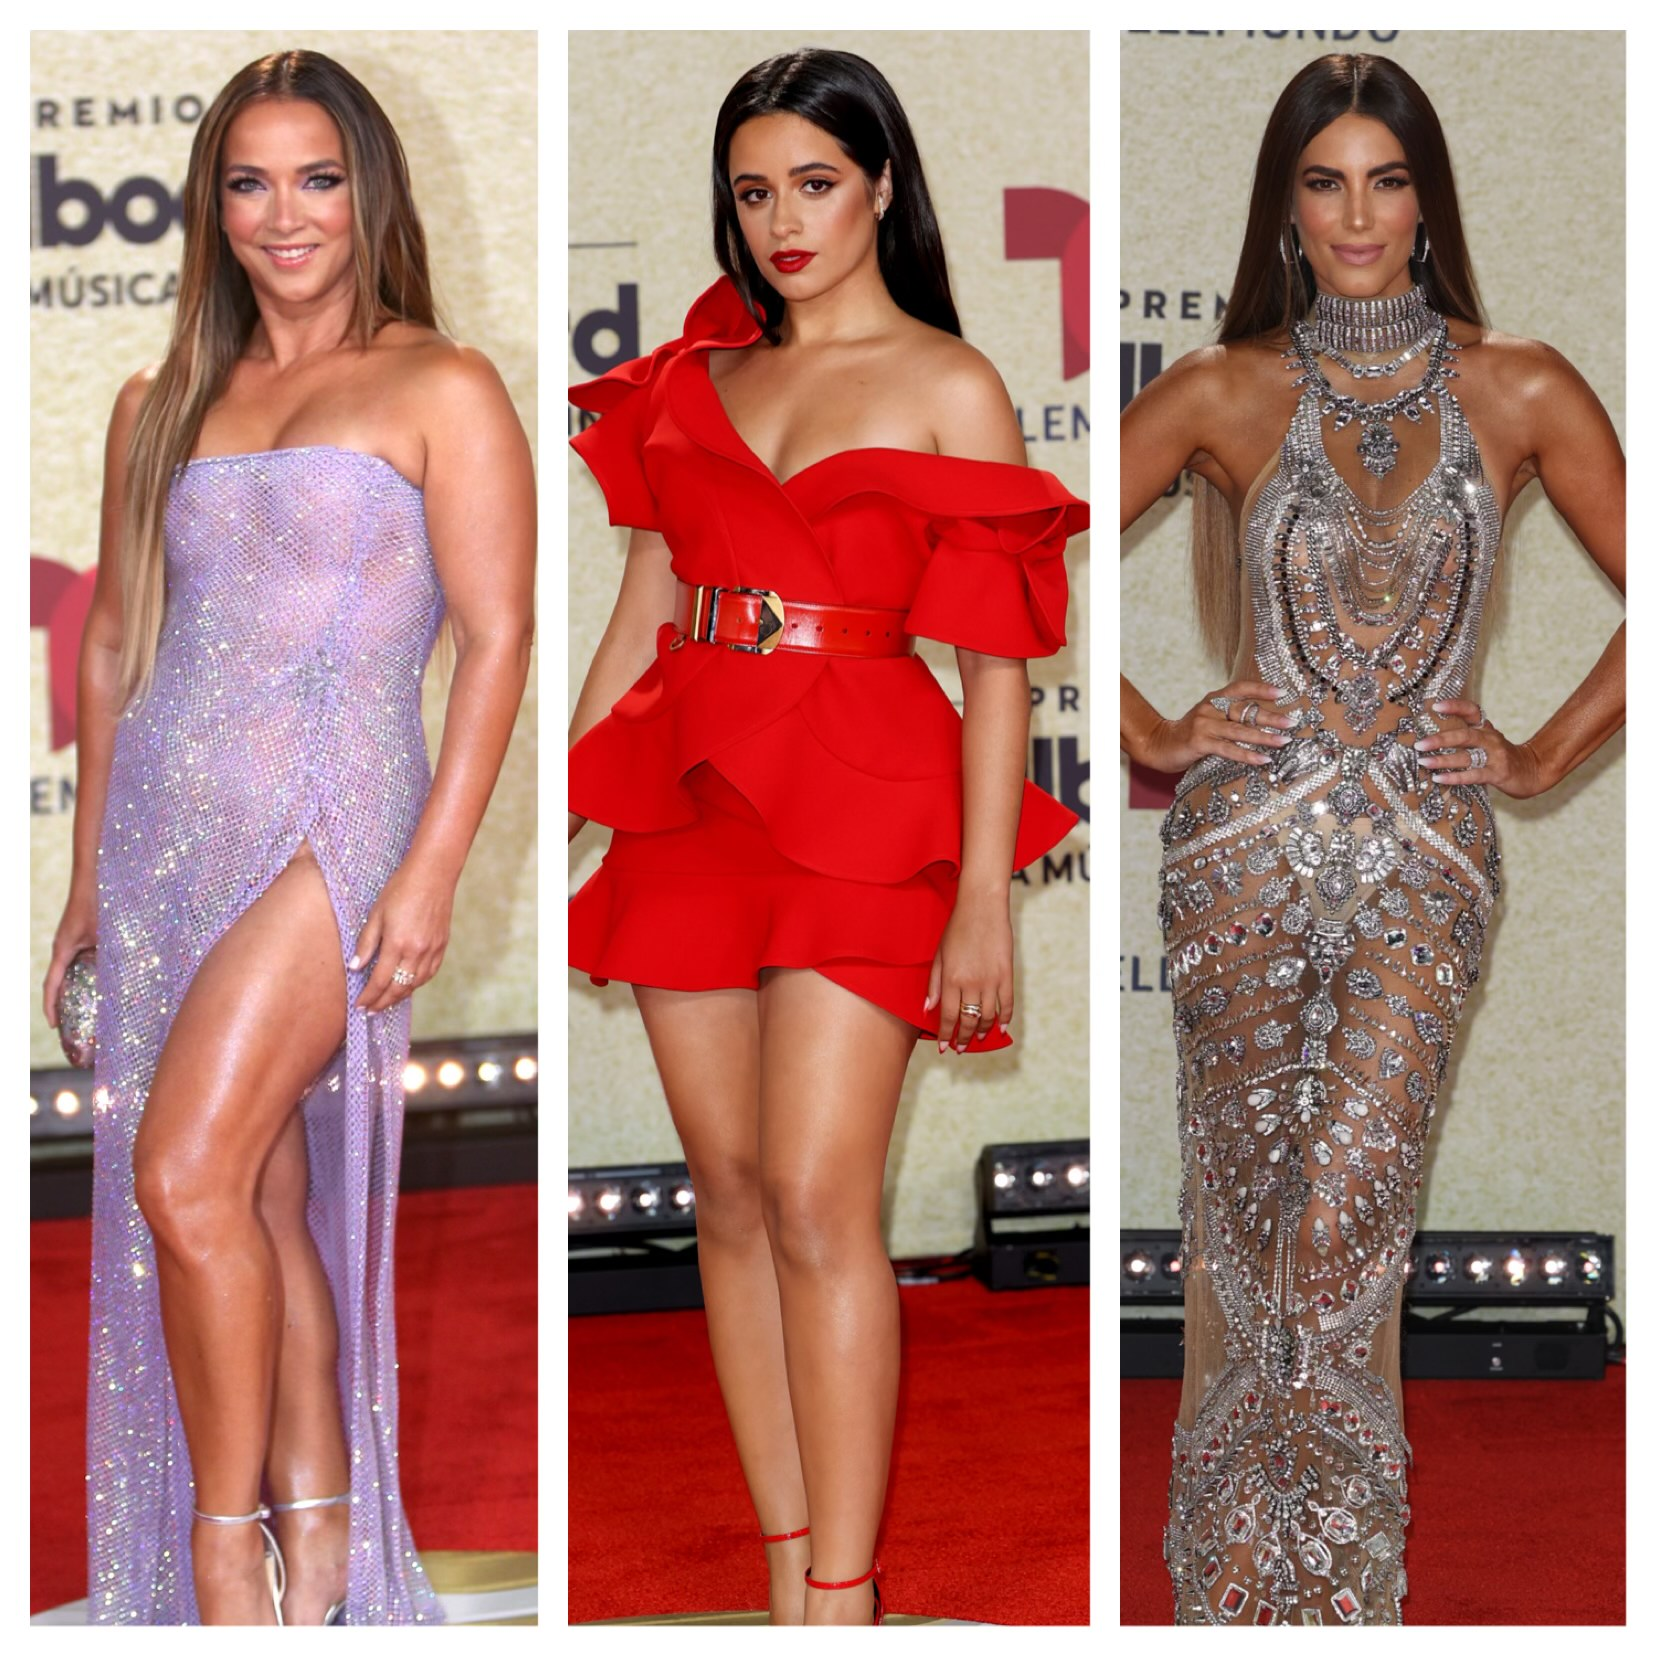 Premios Billboard 2021, adamari lopez, gaby espino, Camila Cabello